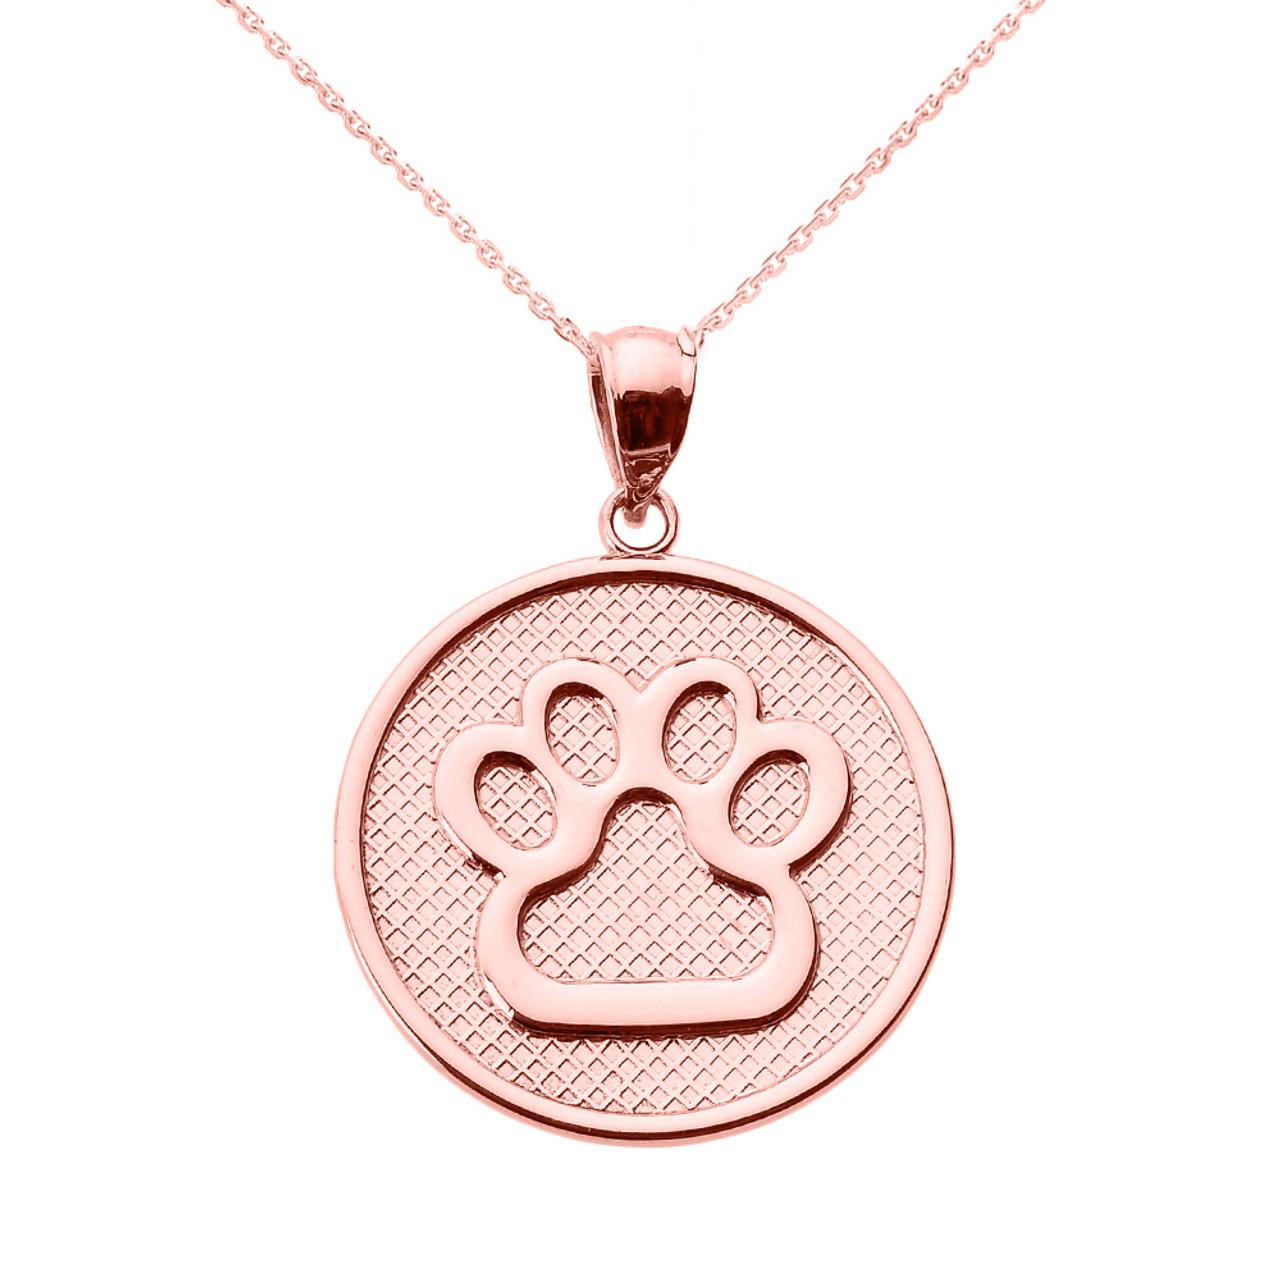 10K Gold Capricorn Zodiac Symbol Cutout Disc Necklace by JEWLR